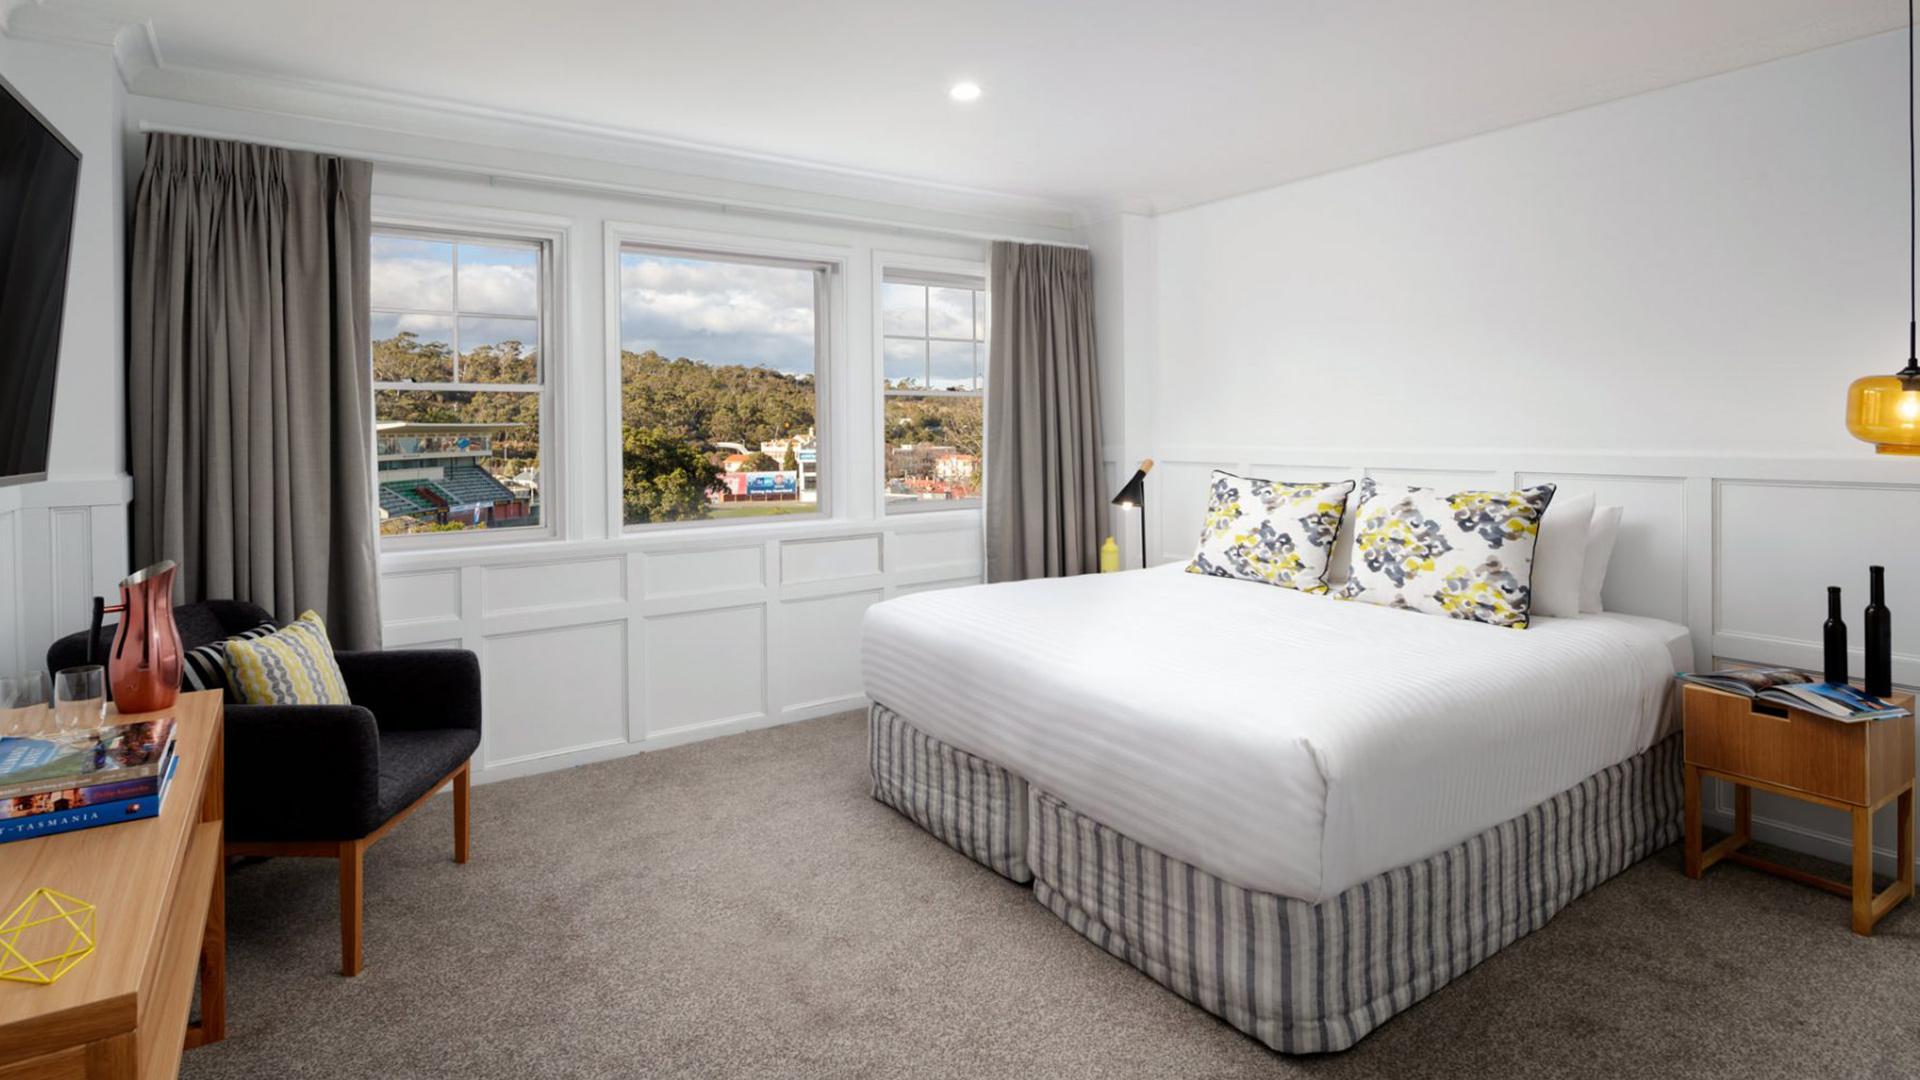 Superior King Room image 1 at Rydges Hobart by Hobart City Council, Tasmania, Australia